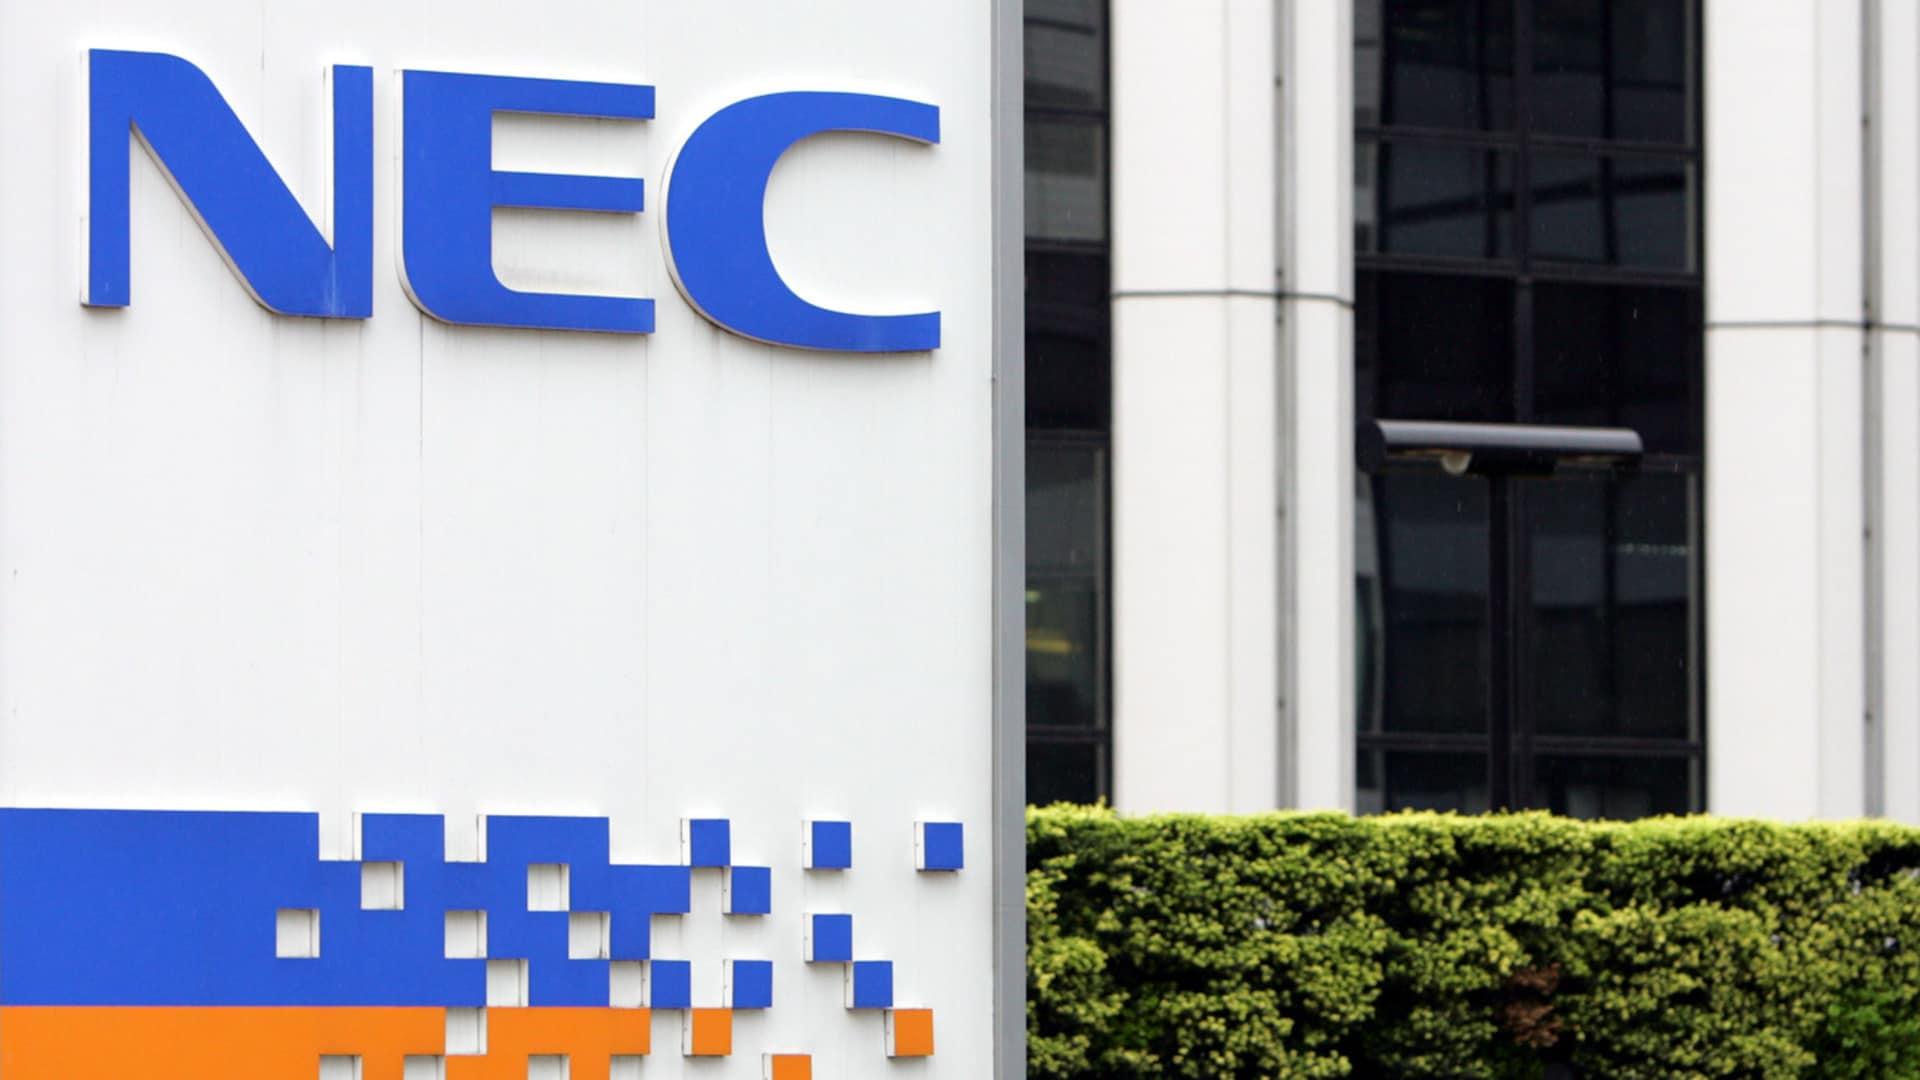 NECがスイス金融ソフト大手アバロックを2360億円で買収 - SWI swissinfo.ch